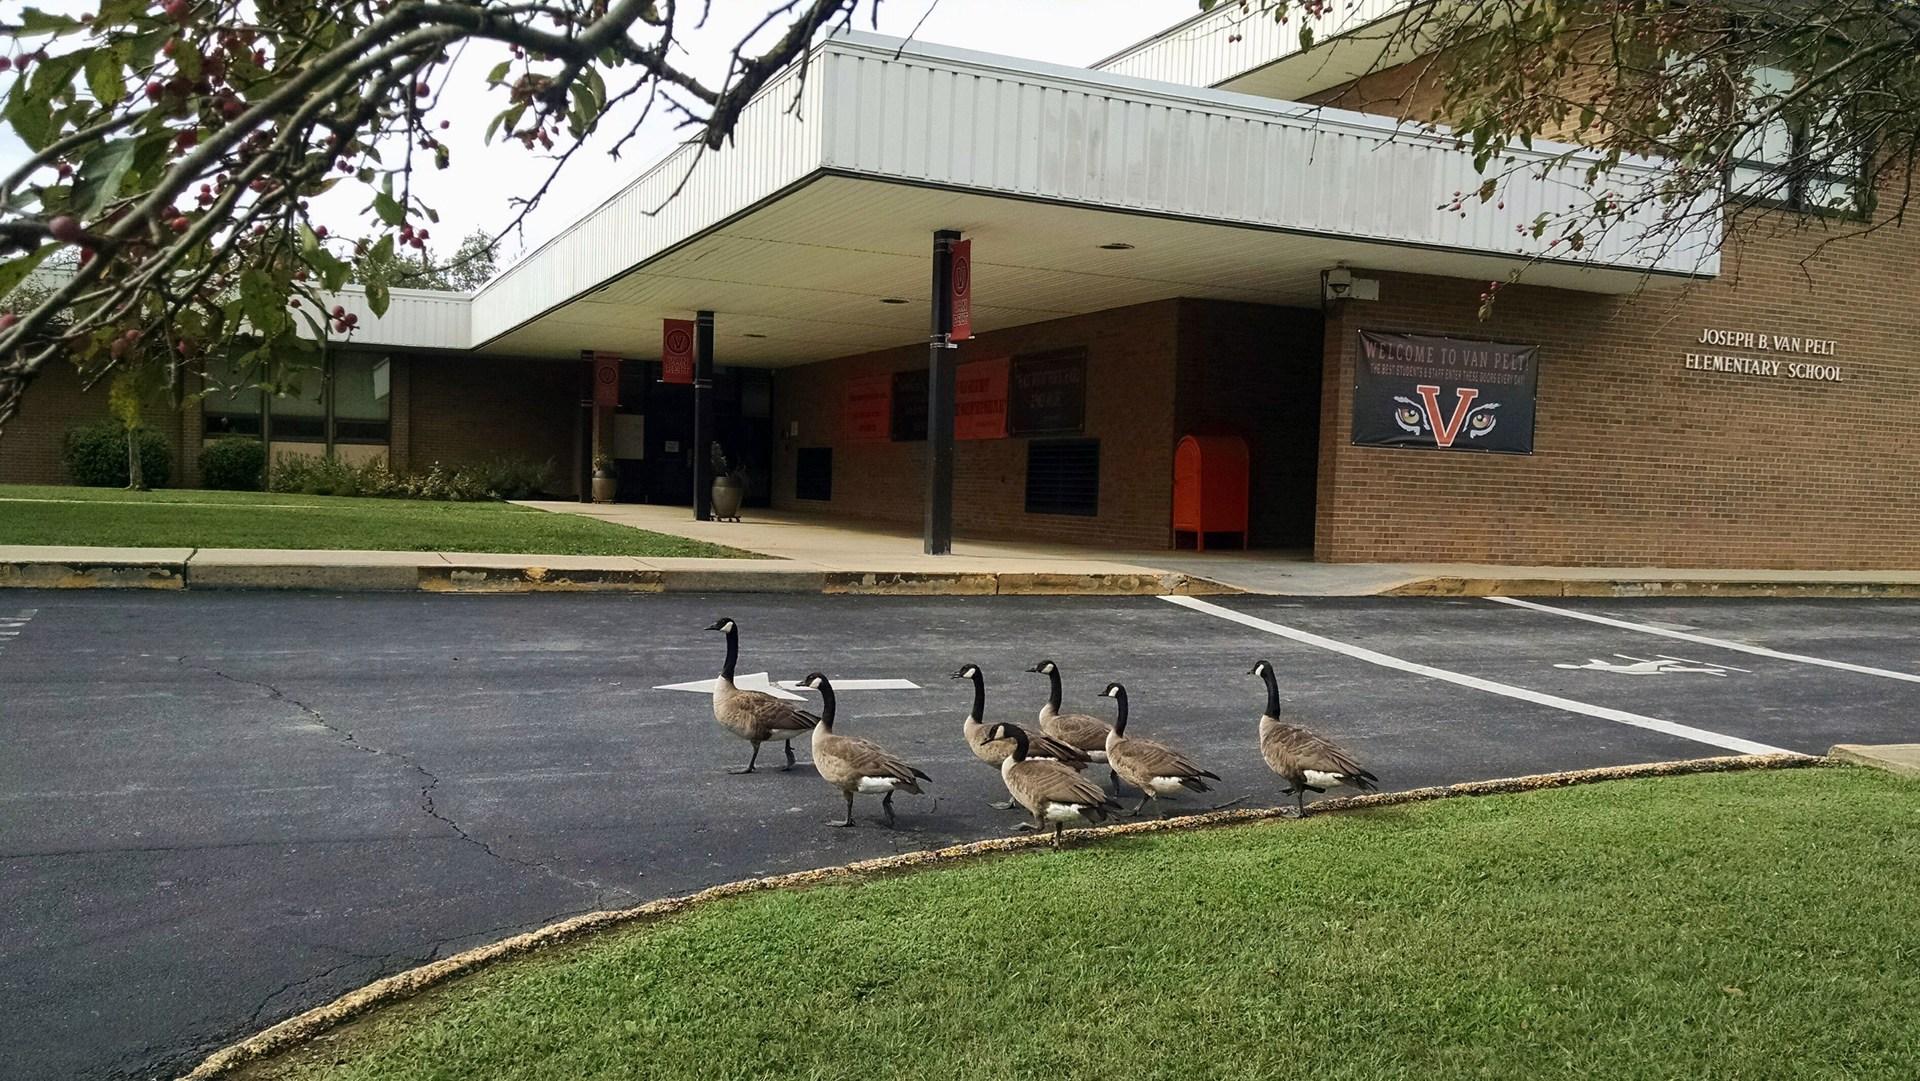 Joseph Van Pelt Elementary School